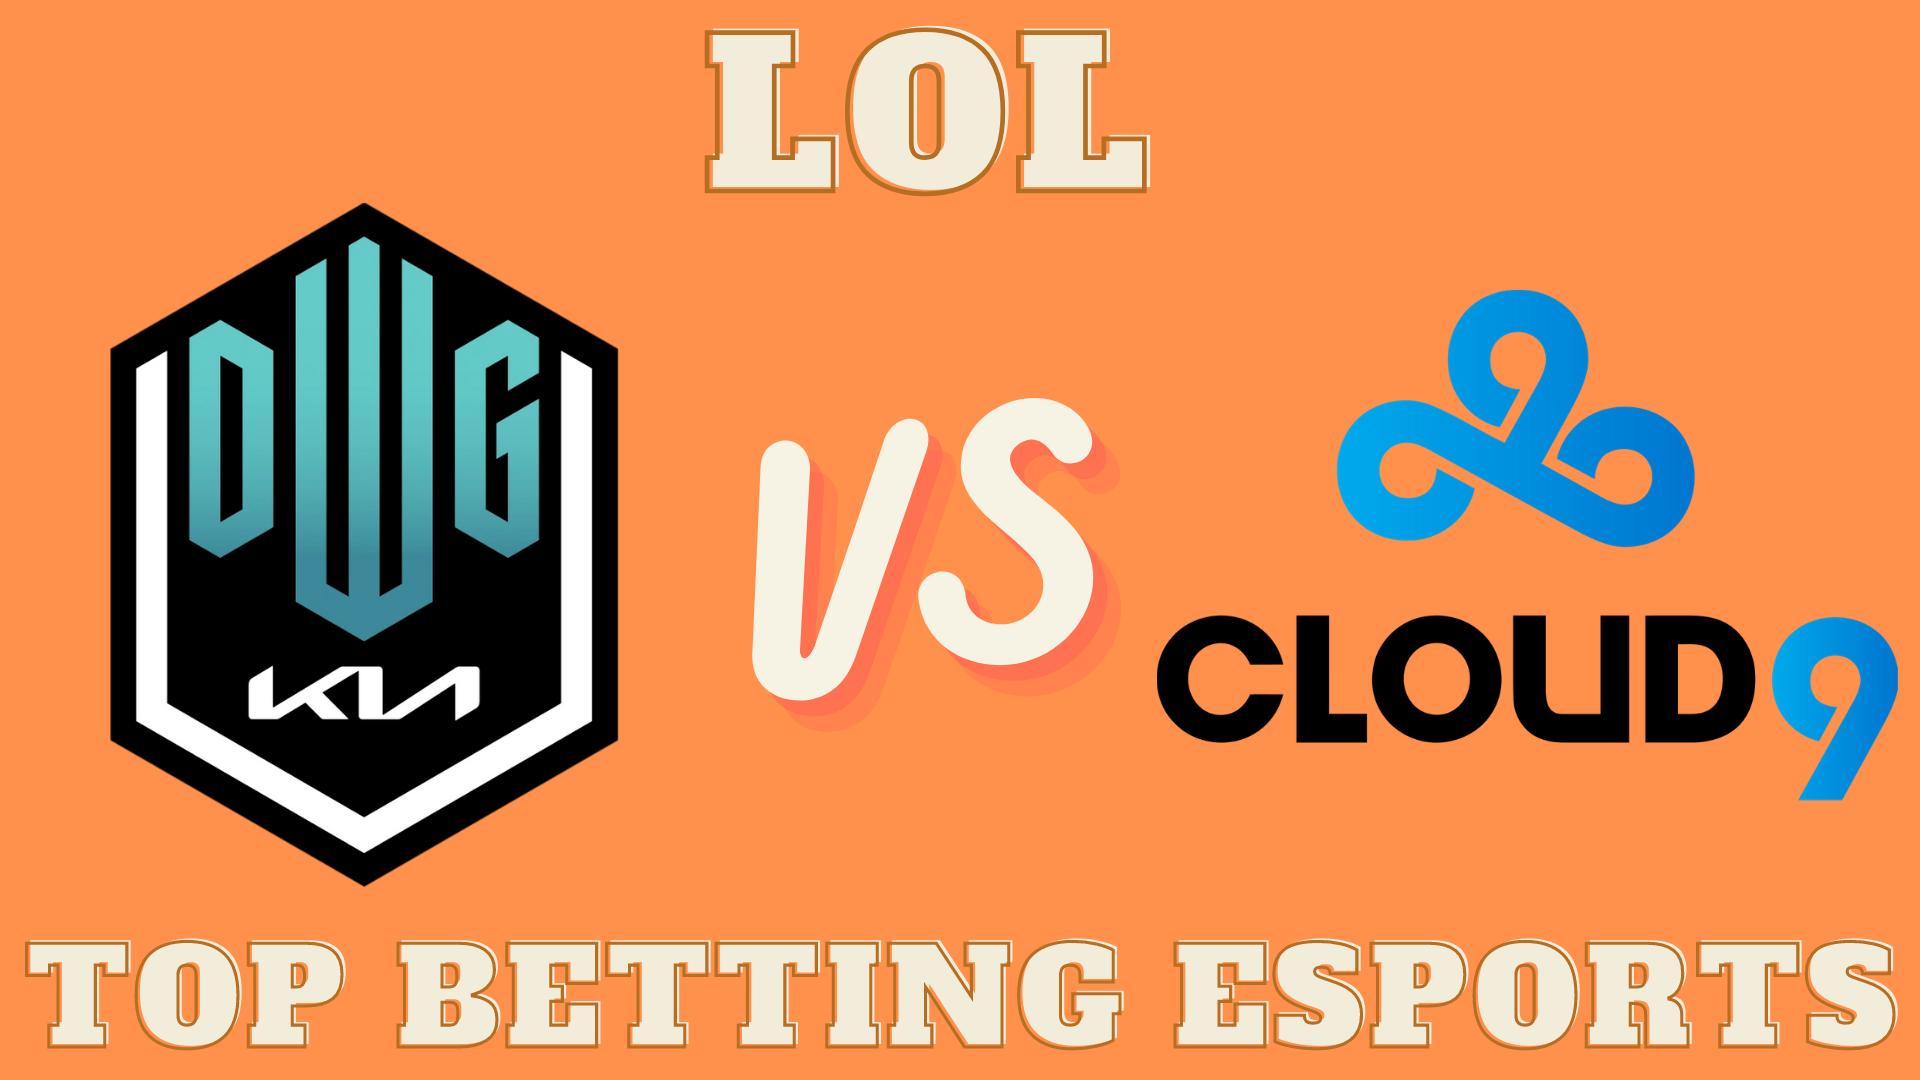 MSI 2021 DWG KIA vs Cloud9 Betting prediction 05.15.2021